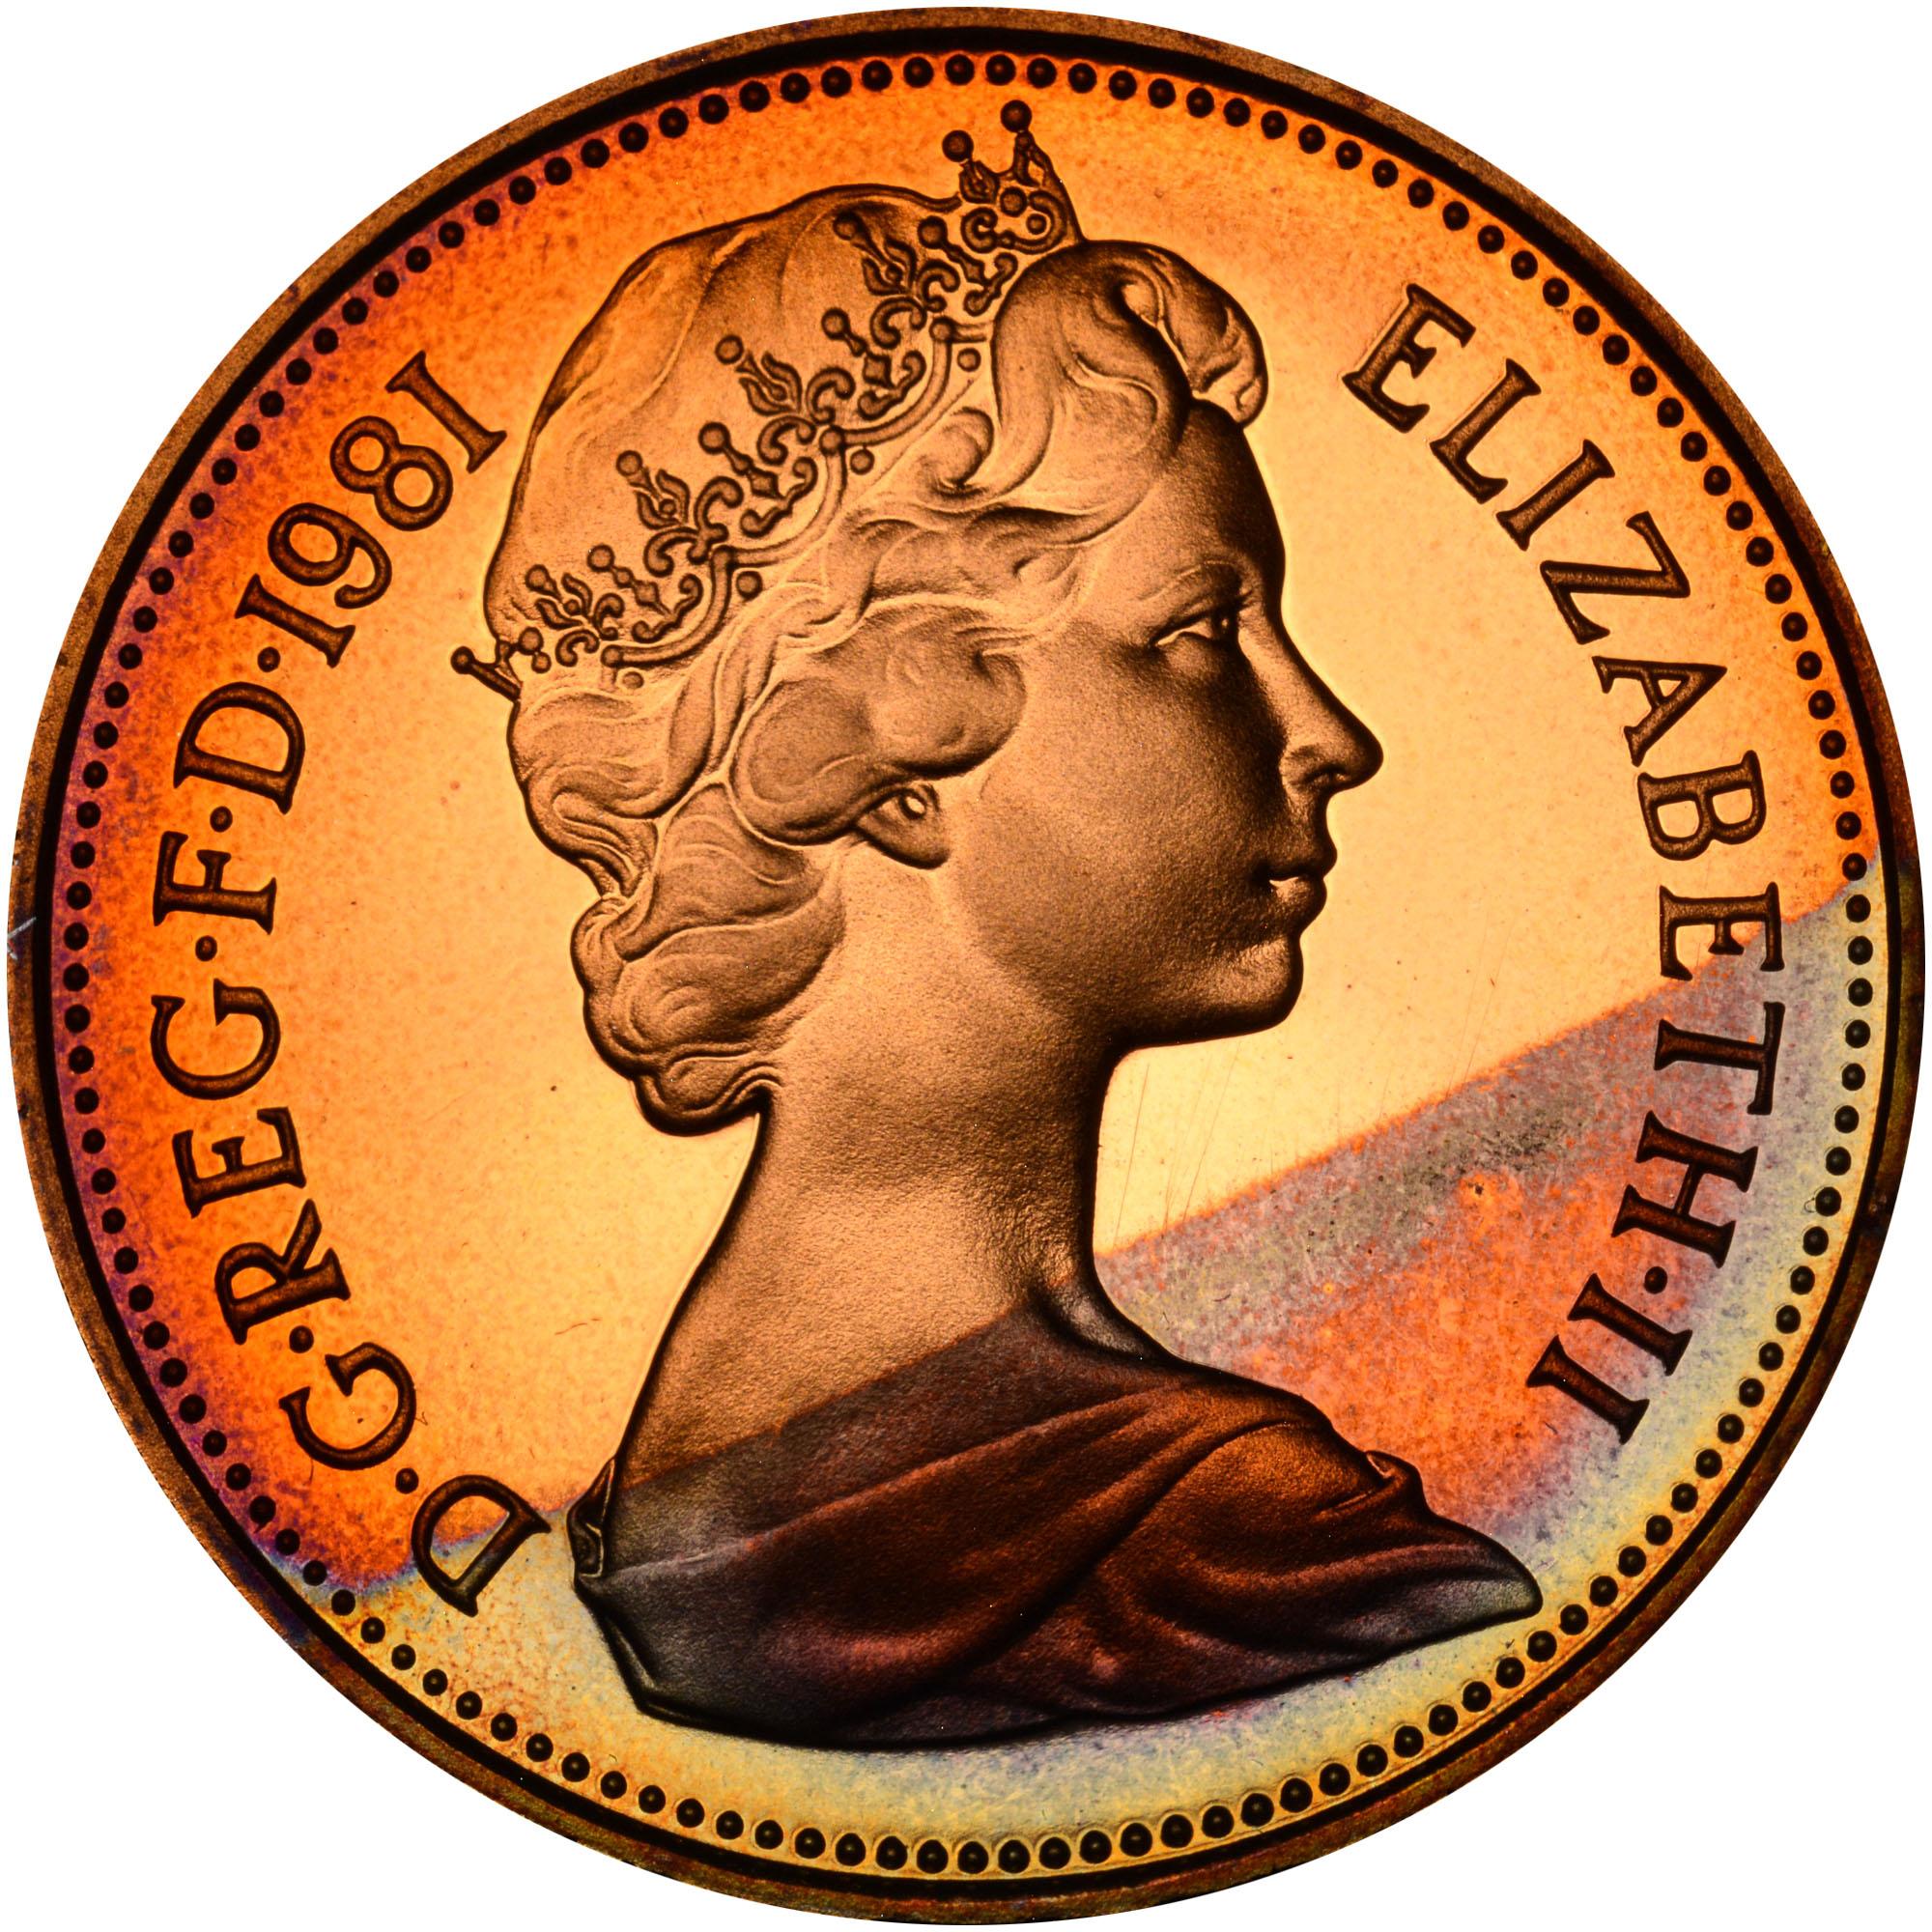 Price Vallue 1976 New Pence